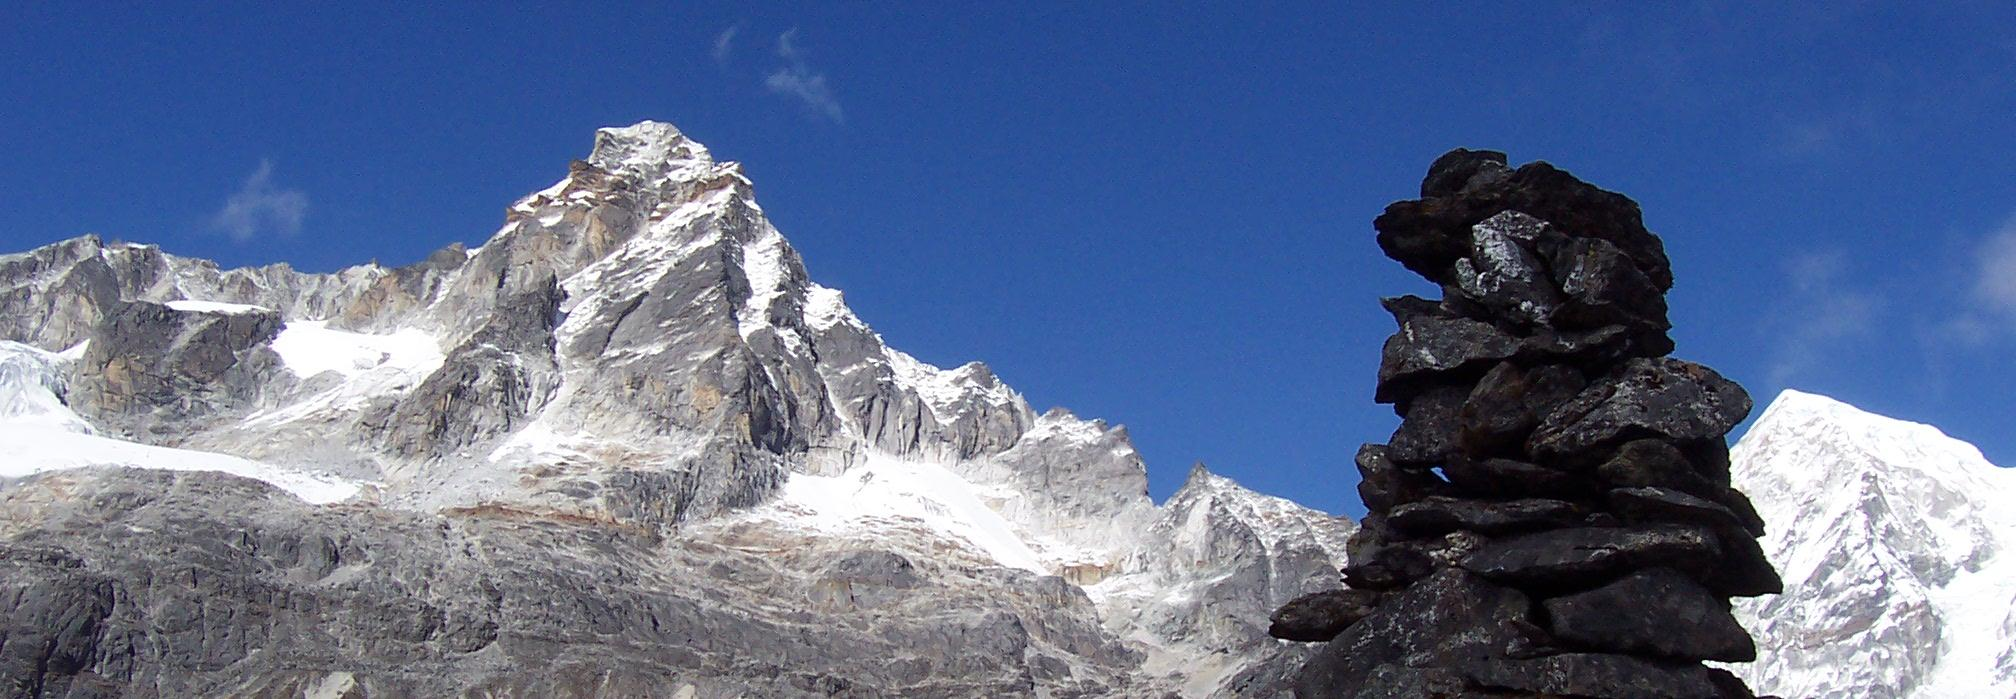 Frey Peak Climbing Expedition